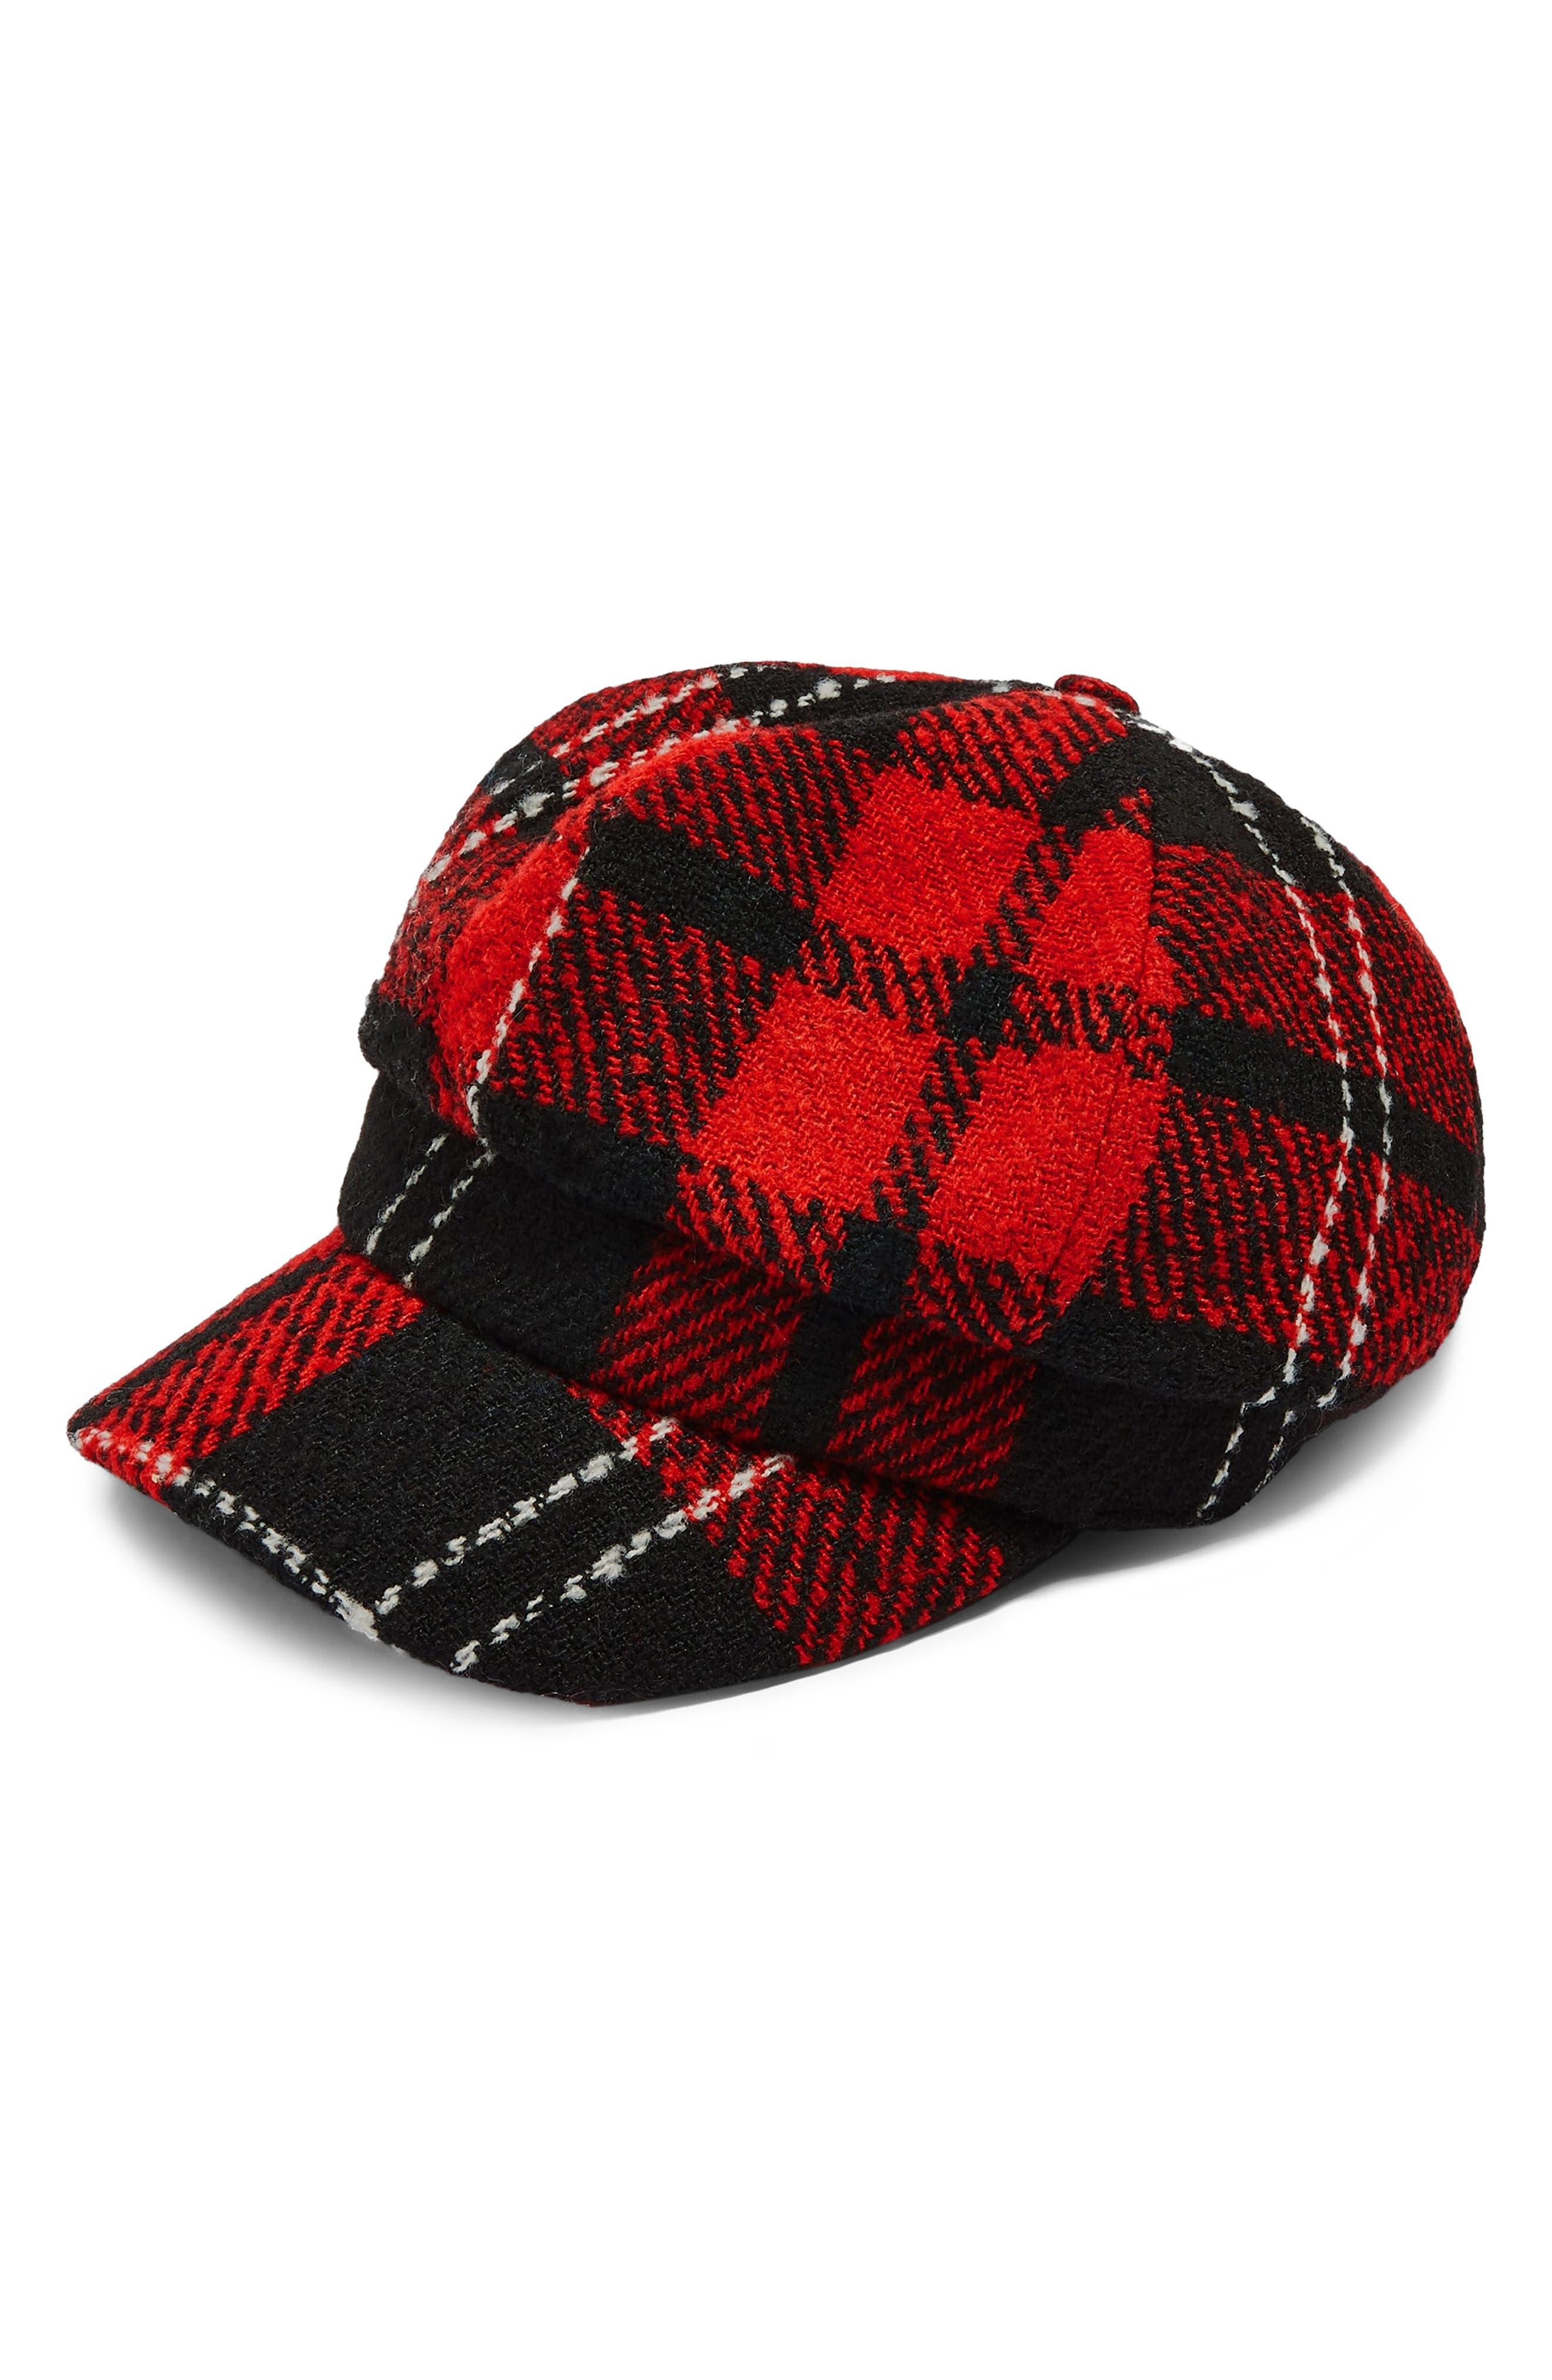 TOPSHOP, Lumberjack Baker Boy Hat, Alternate thumbnail 4, color, 600